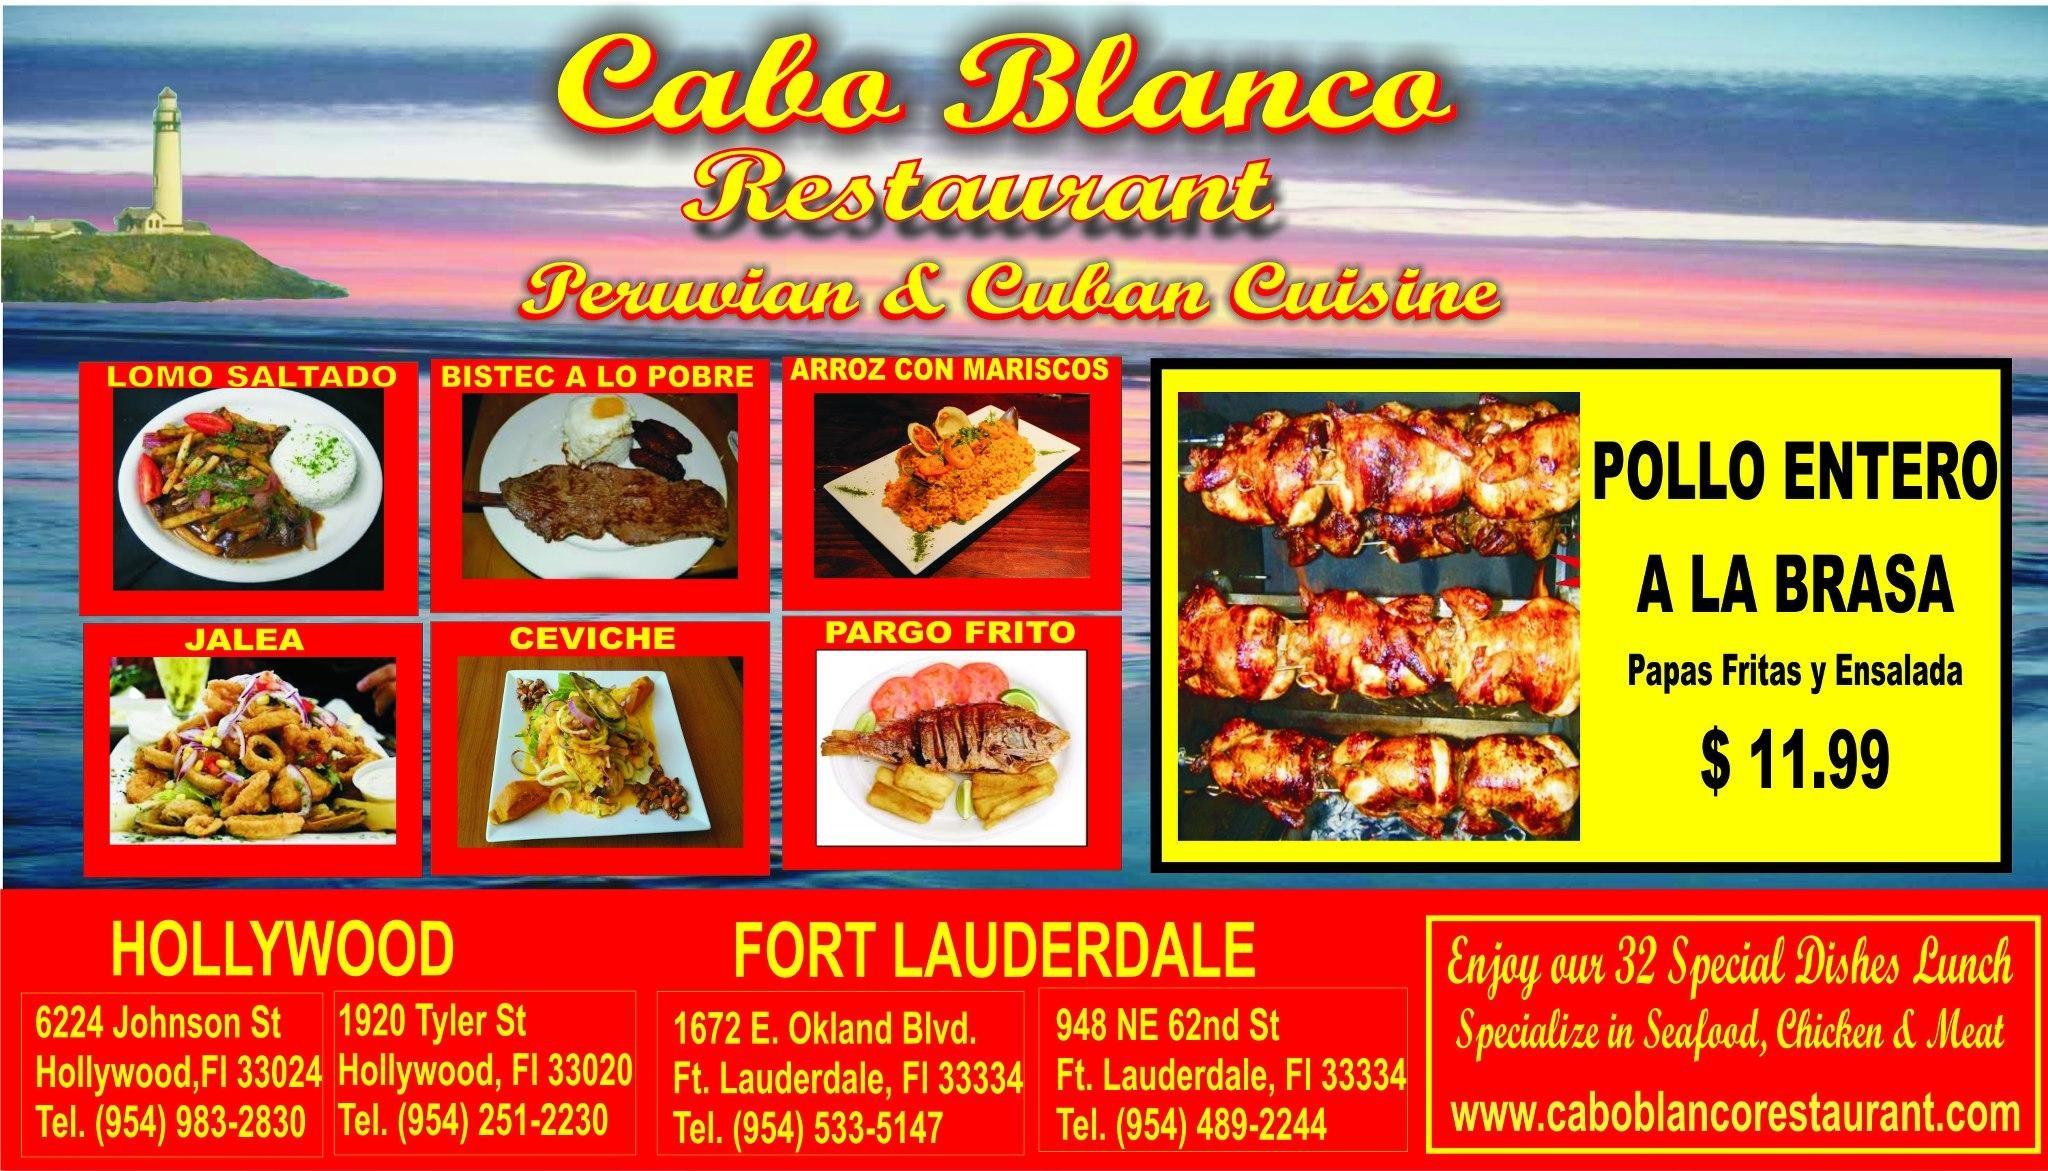 Cabo Blanco Restaurant